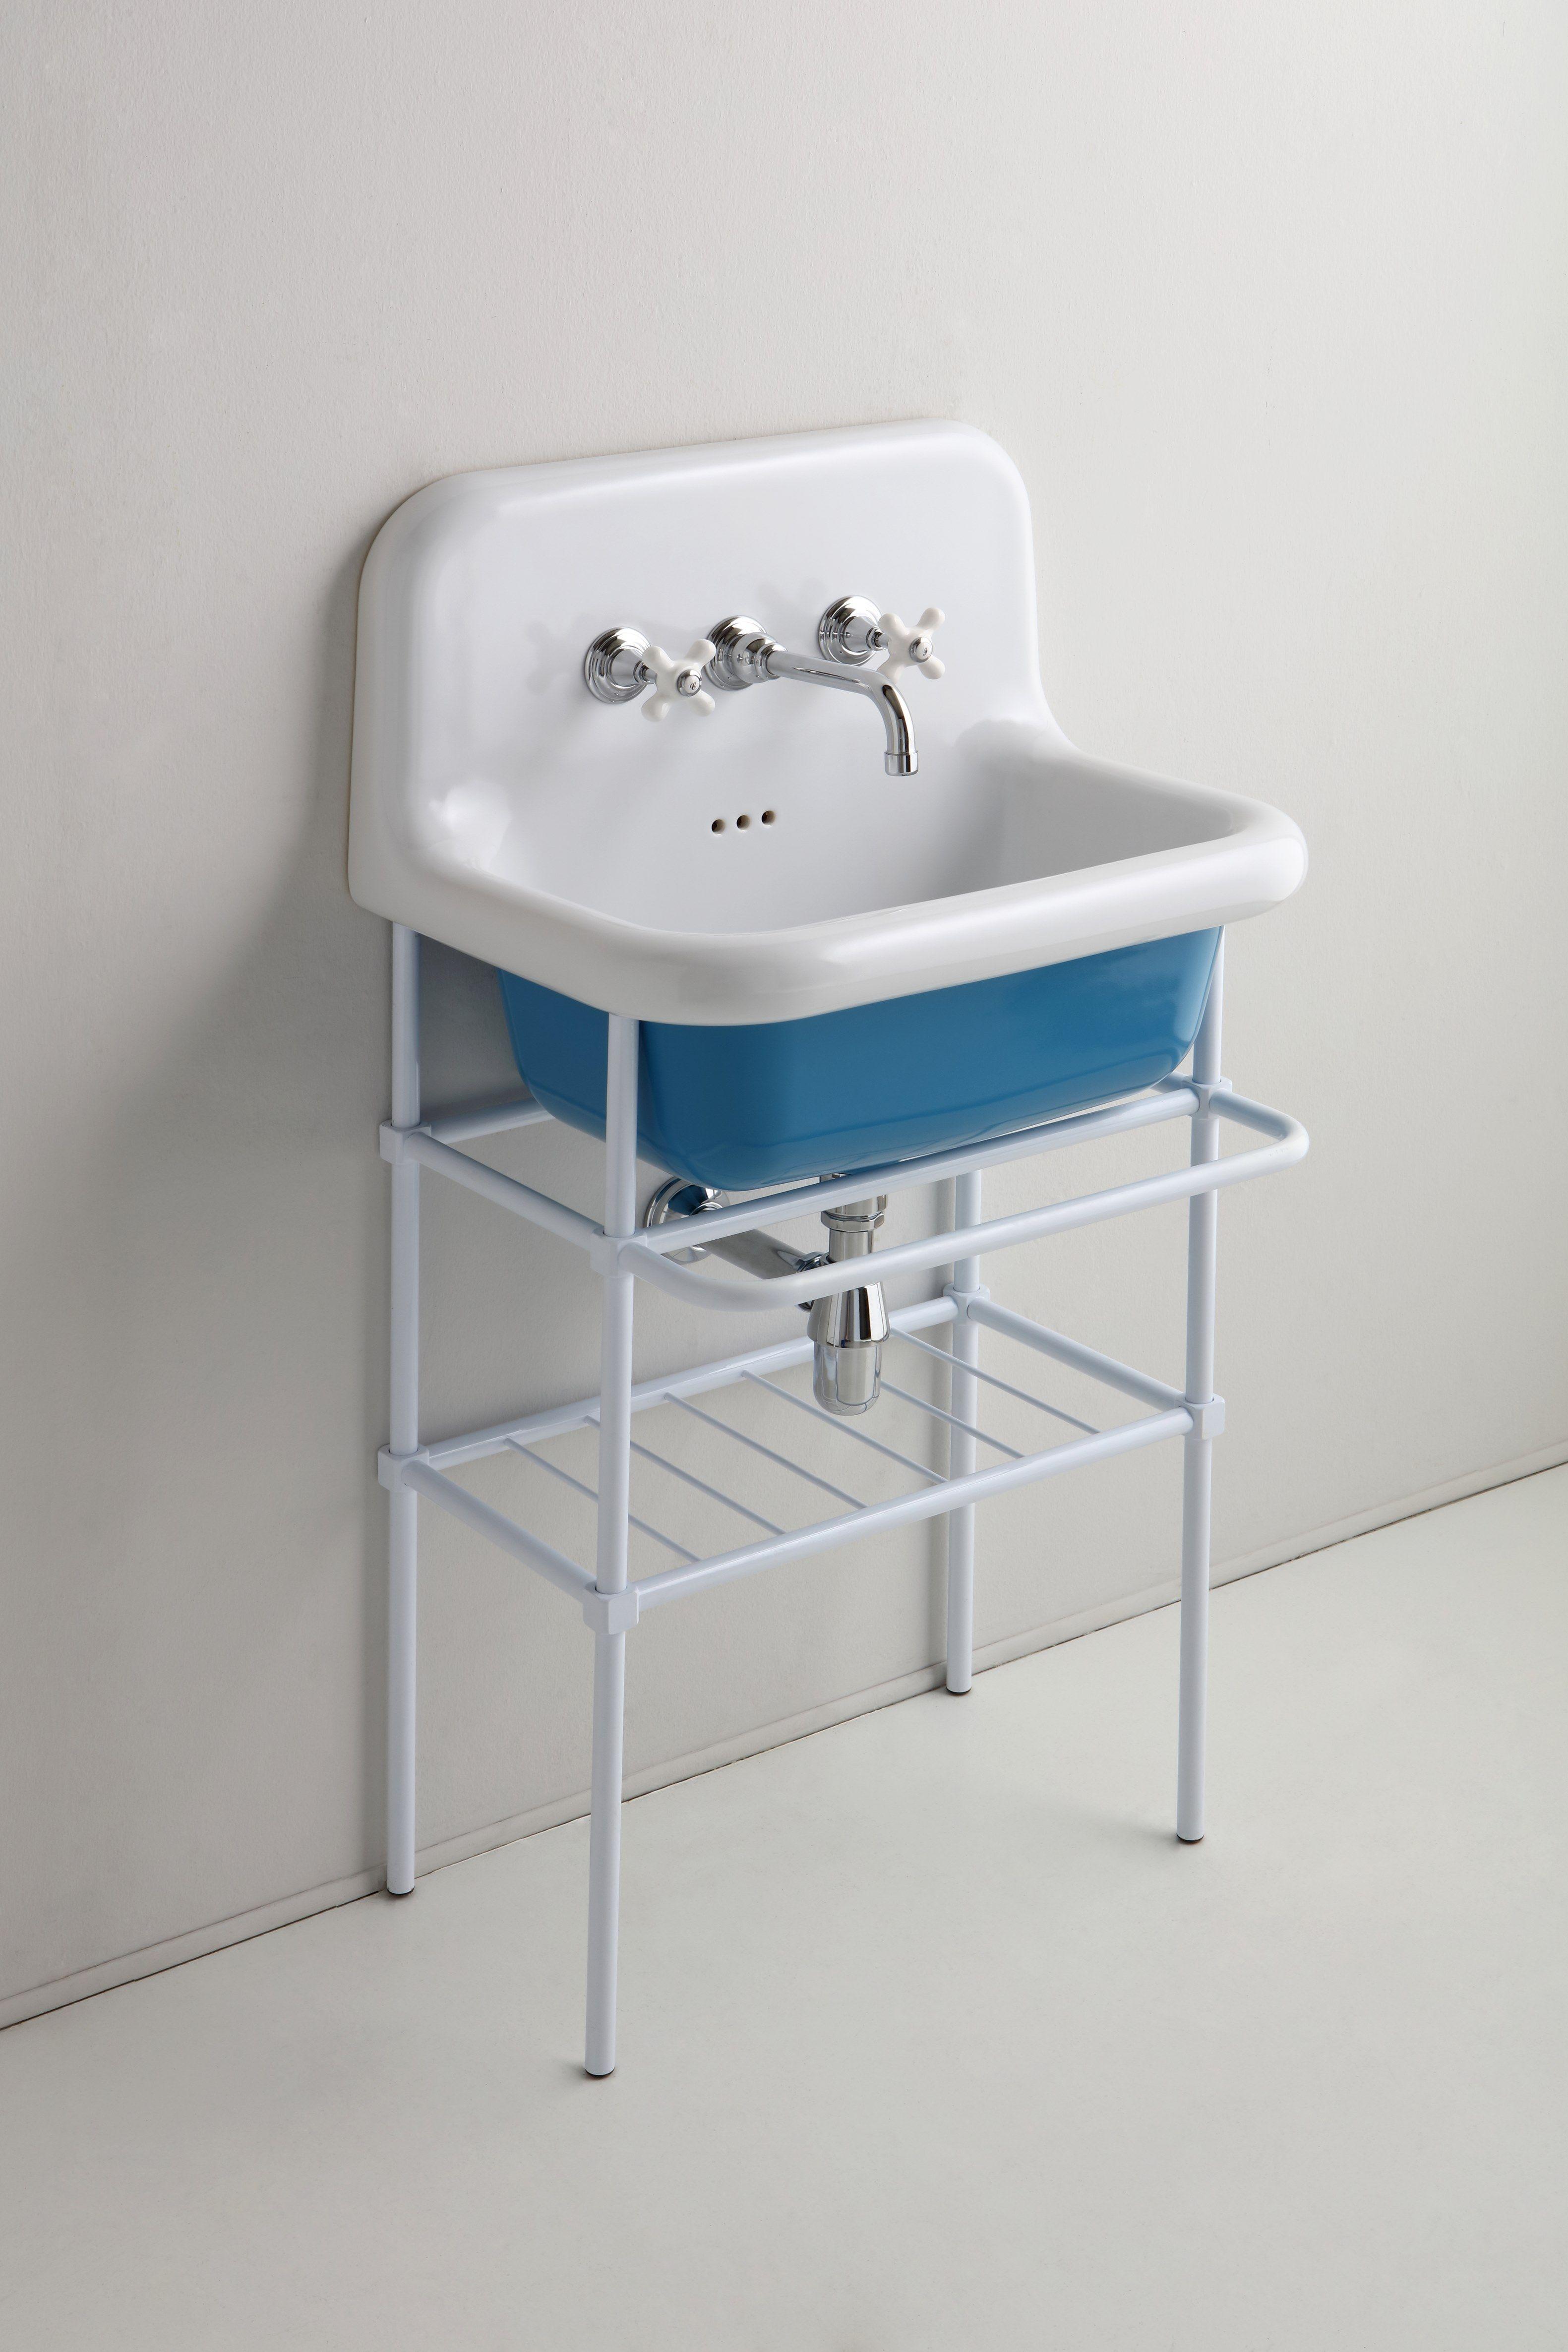 TRUECOLORS | Console washbasin TrueColors Collection By BLEU PROVENCE